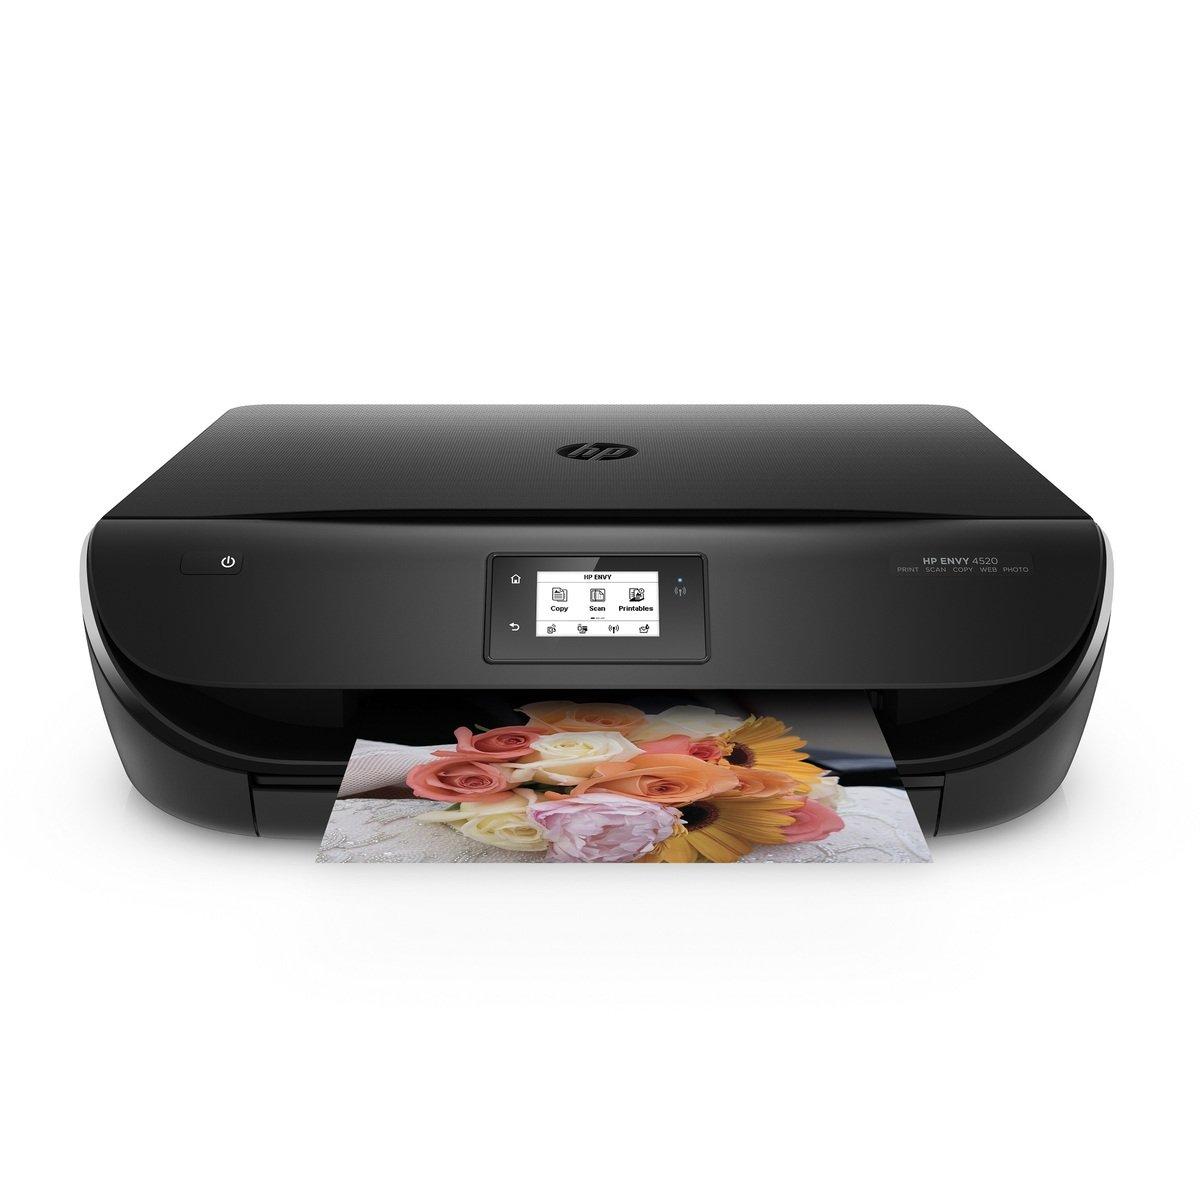 ENVY 4520 噴墨多功能打印機